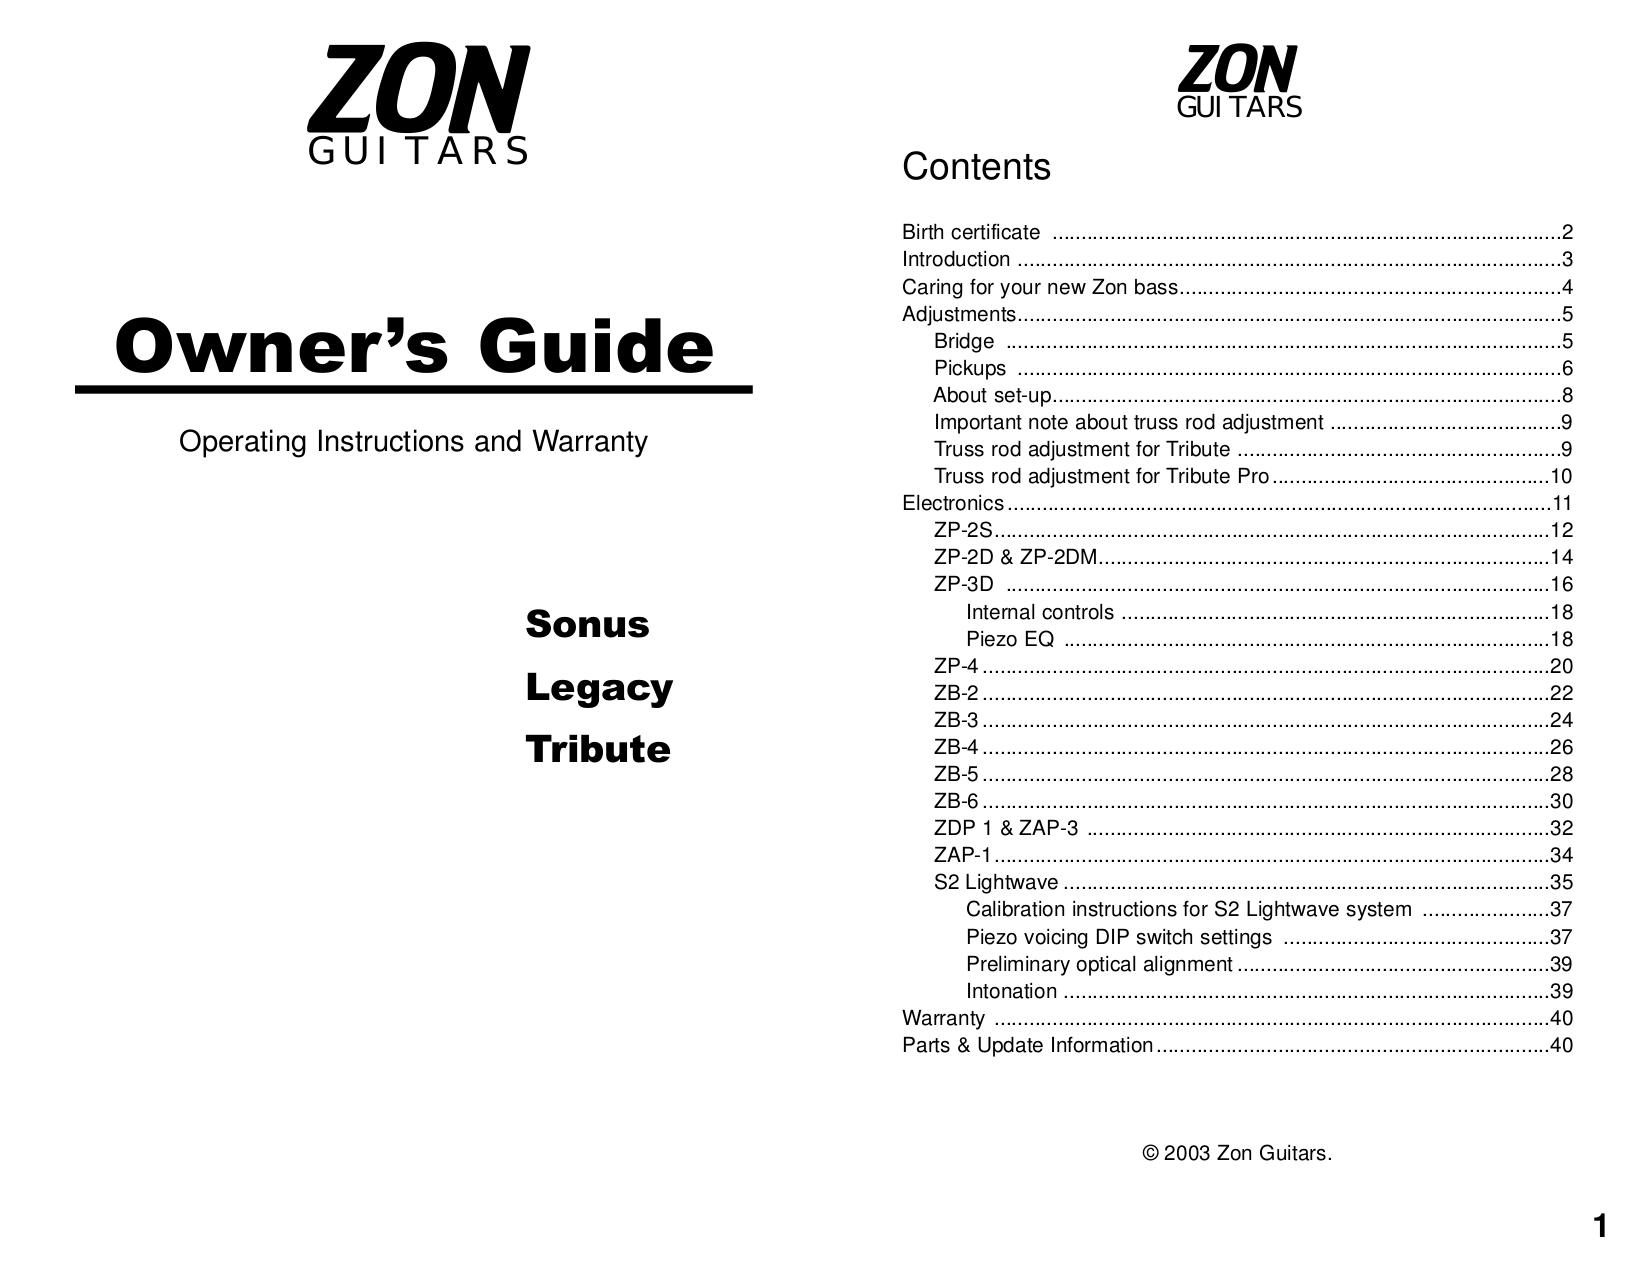 pdf for Zon Guitar Legacy Elite Special5 manual